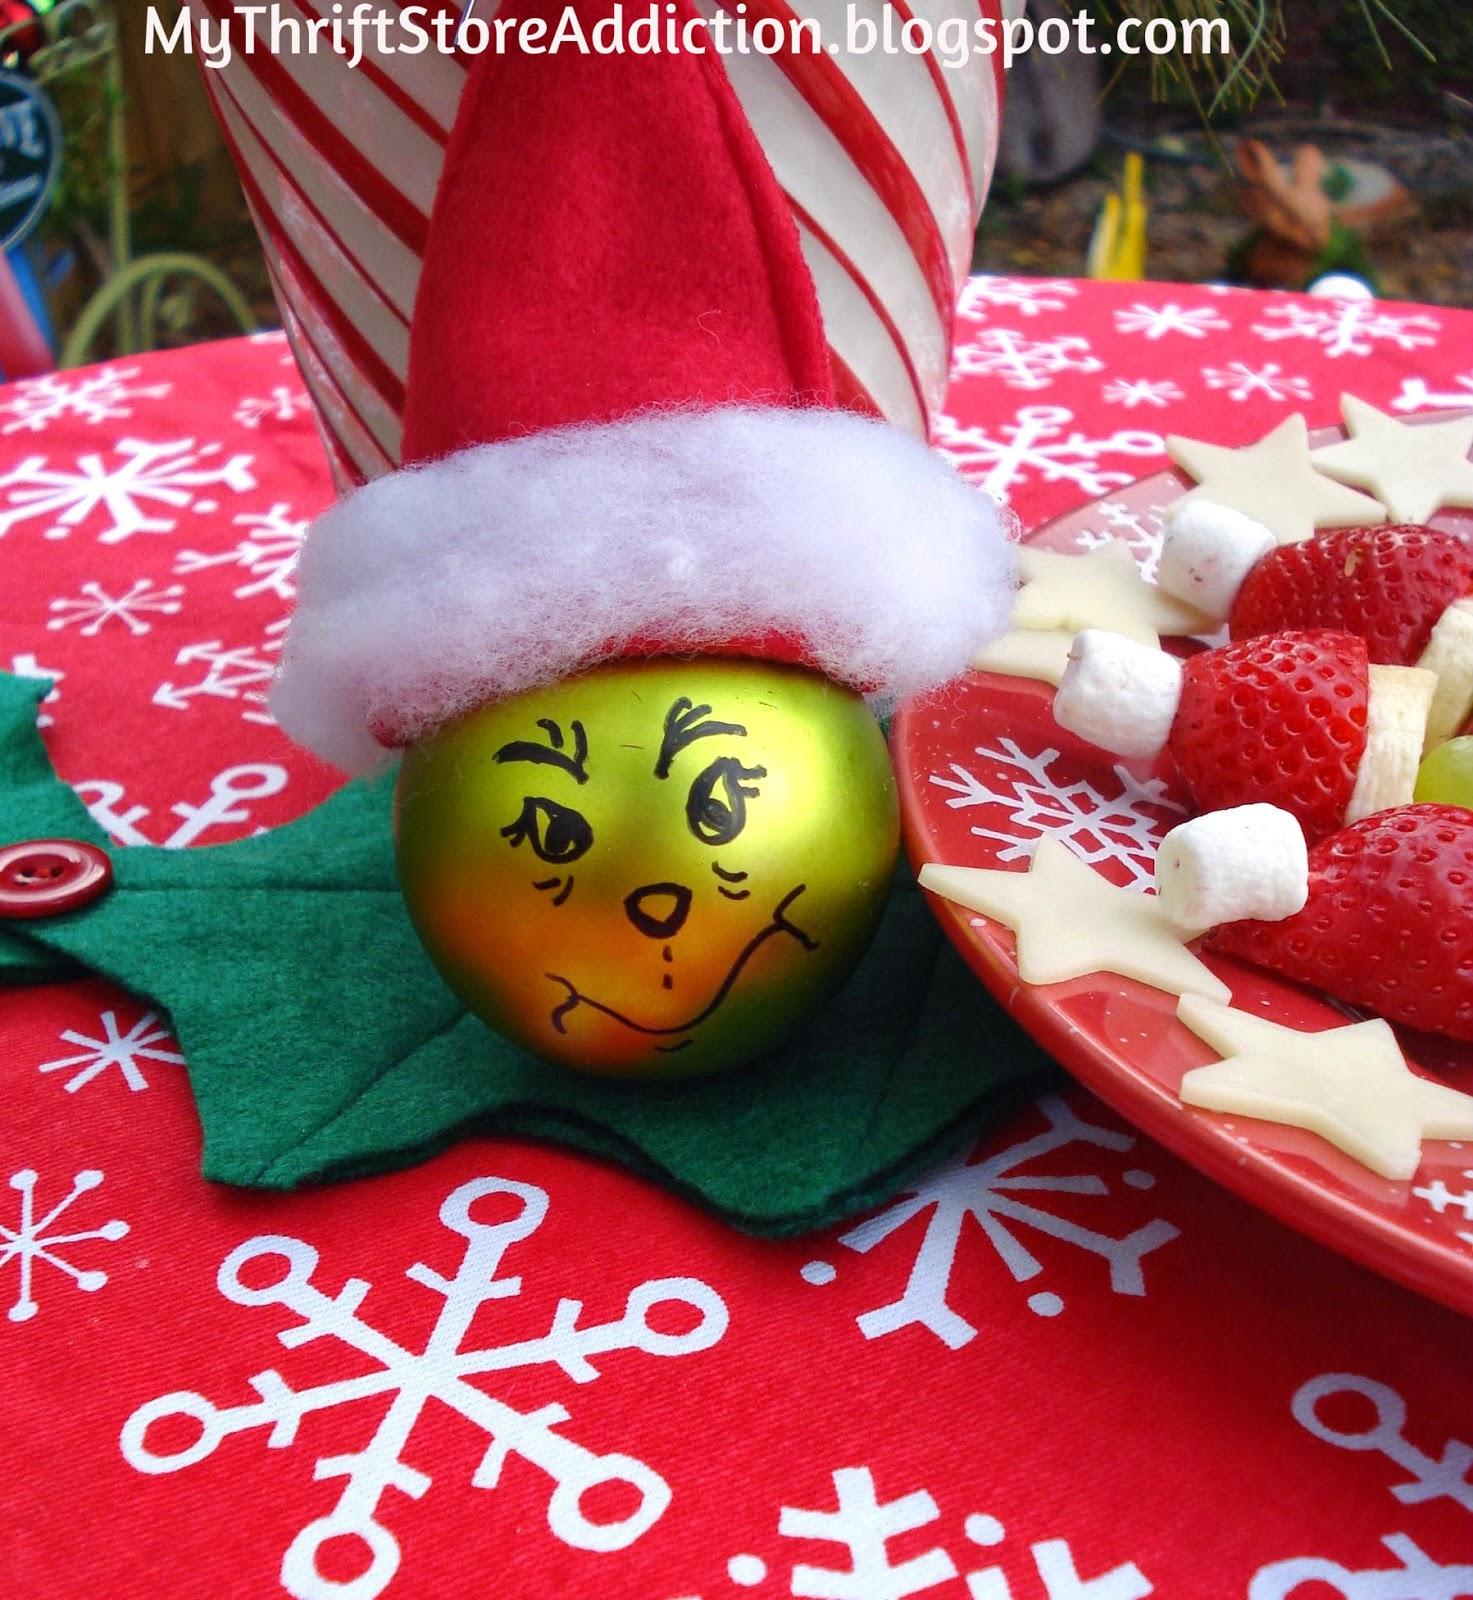 Handmade Grinch Christmas ornament